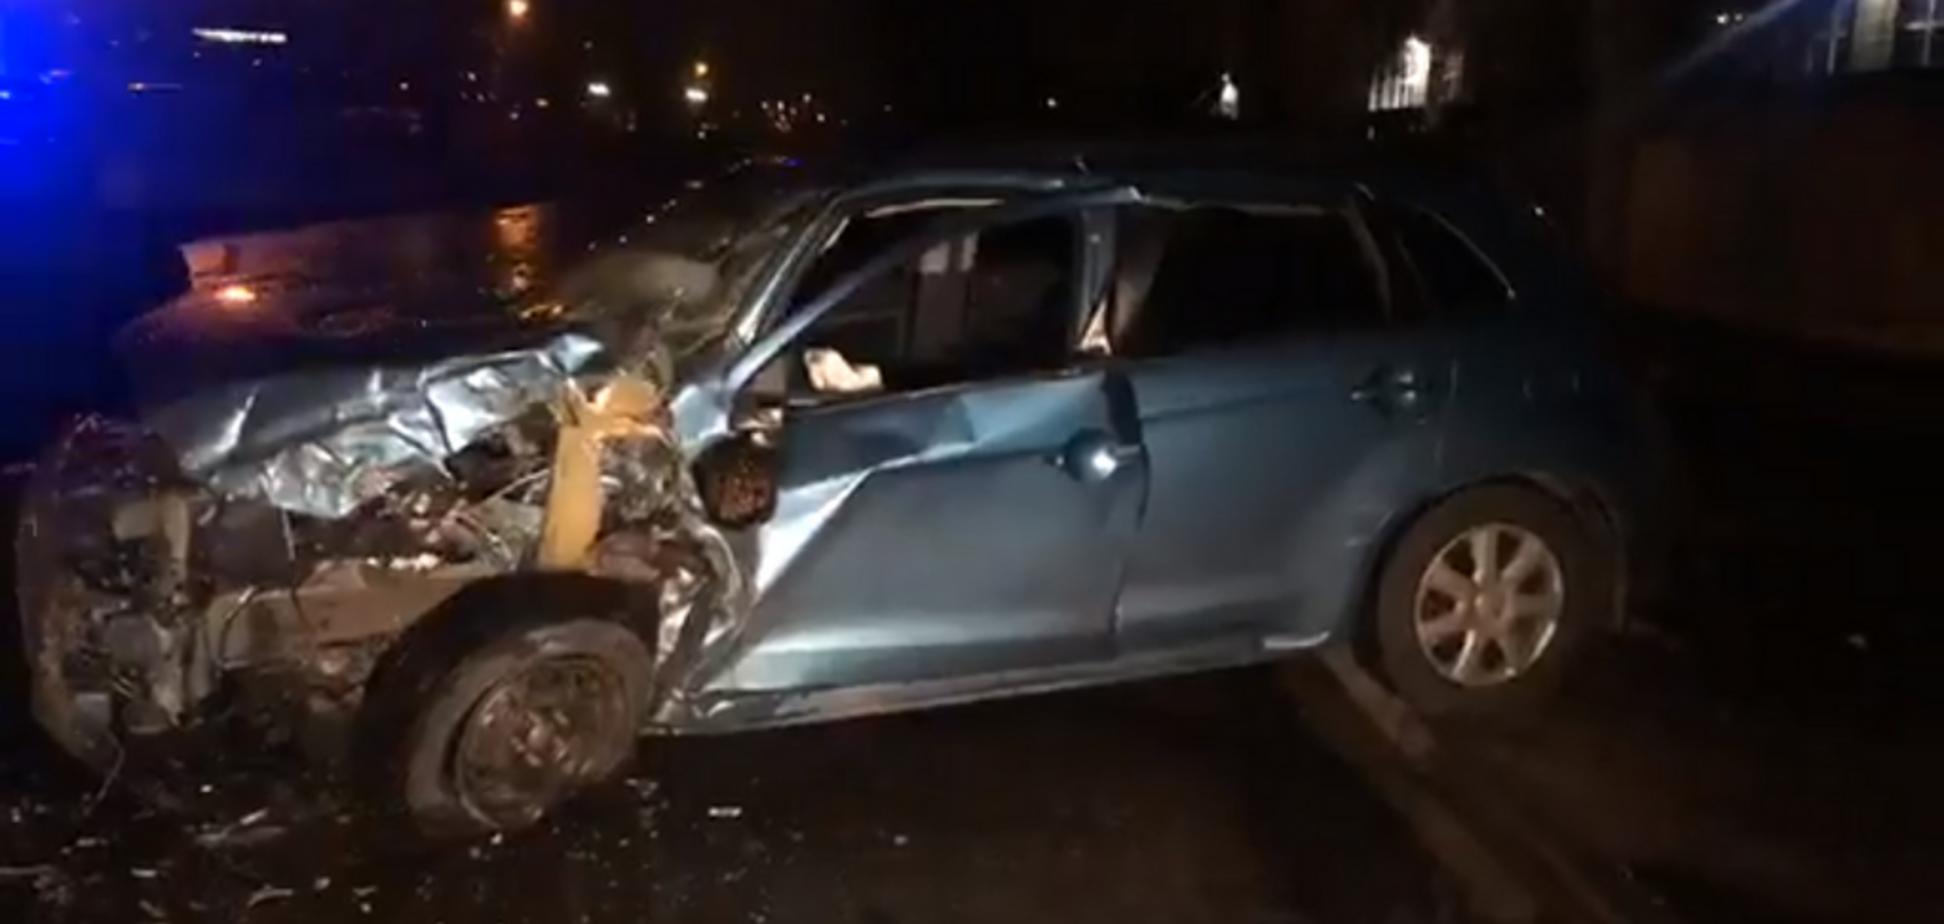 Машина після зіткнення з маршруткою